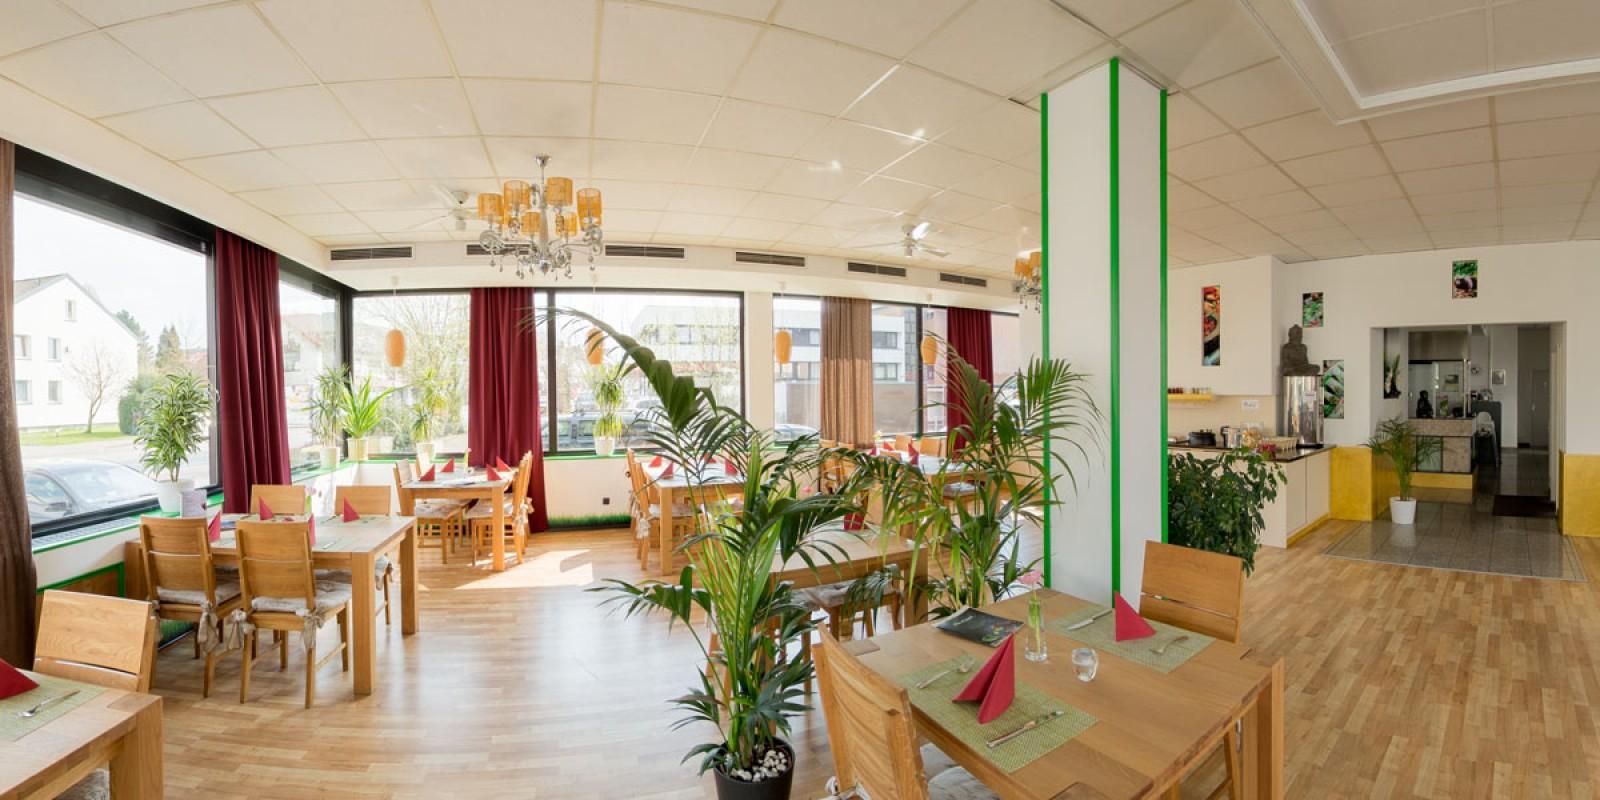 restaurant veggie delicious in bielefeld. Black Bedroom Furniture Sets. Home Design Ideas